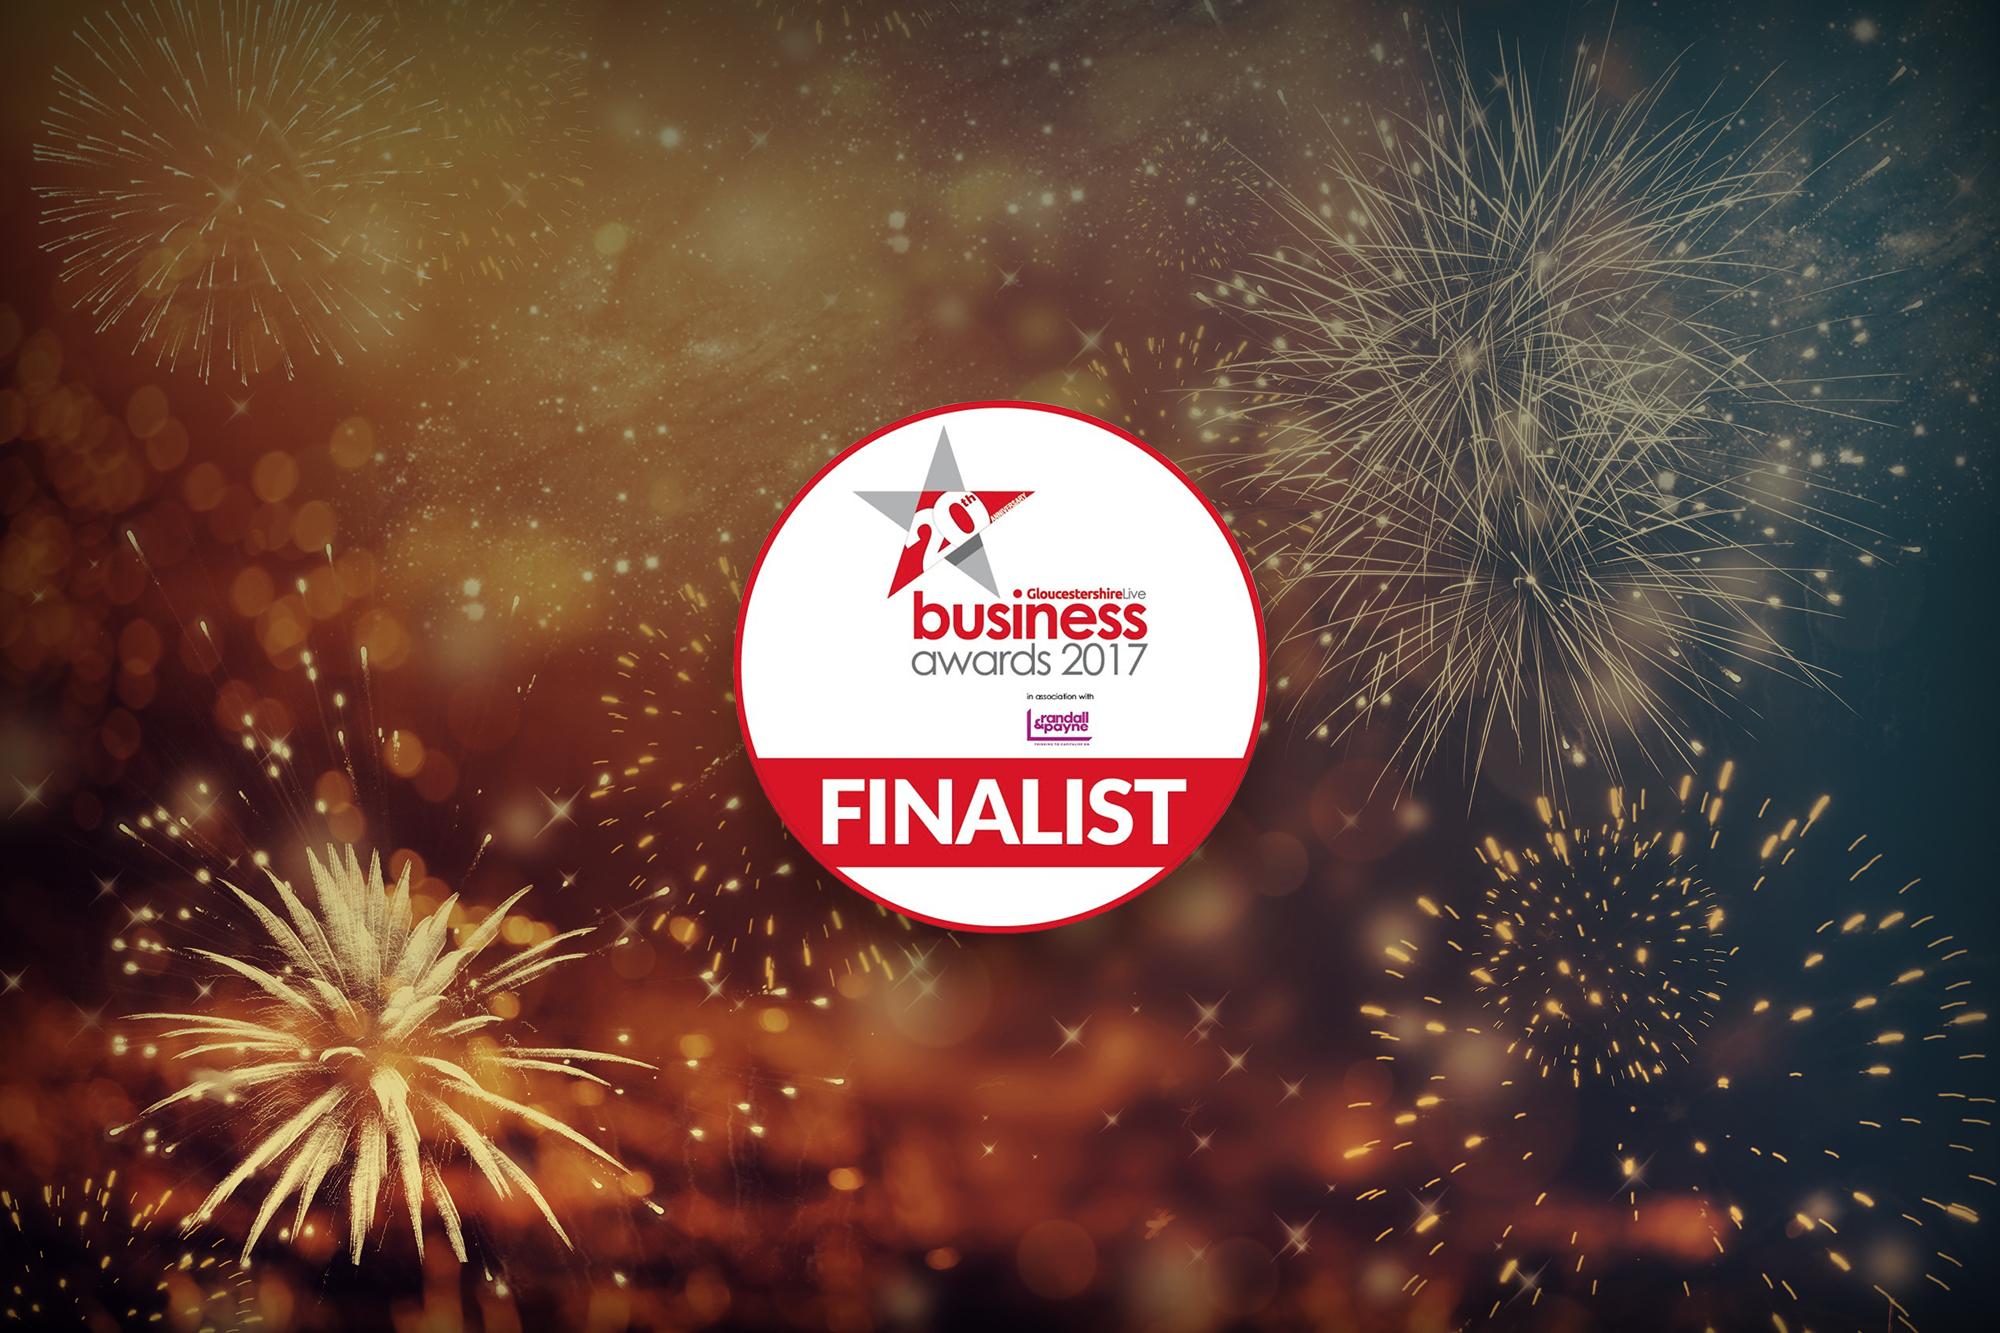 Glos Business Awards Finalist